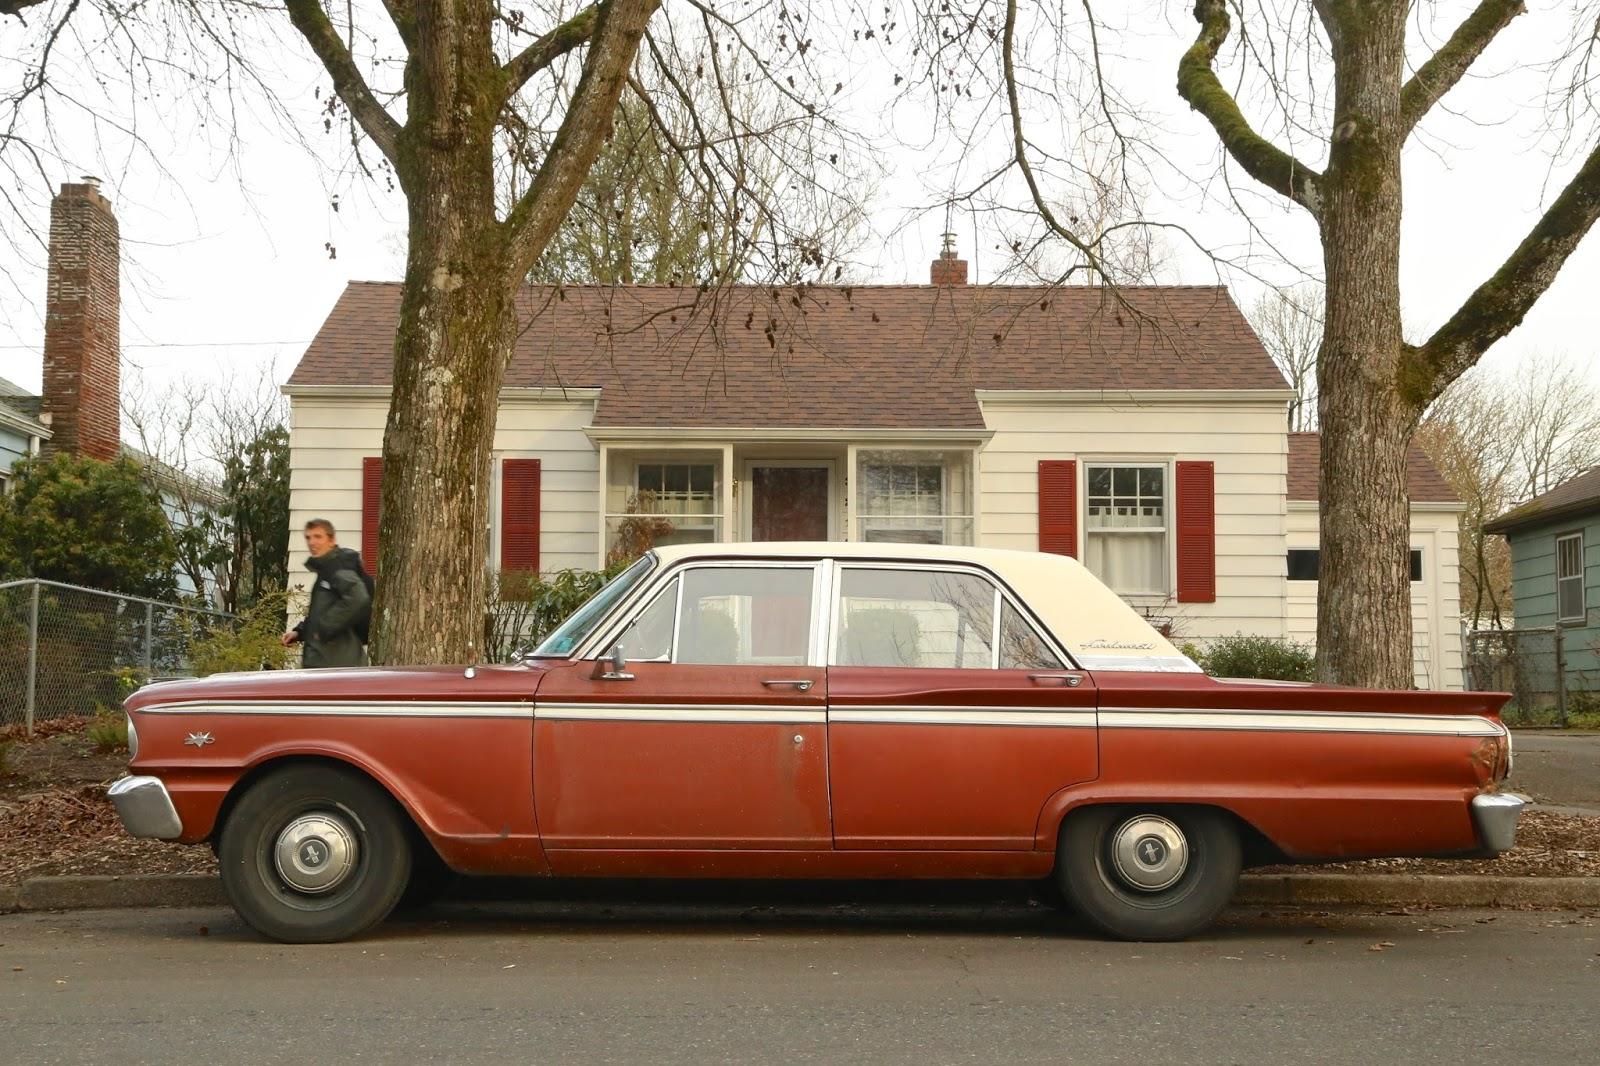 1963 Ford Fairlane 500 sedan